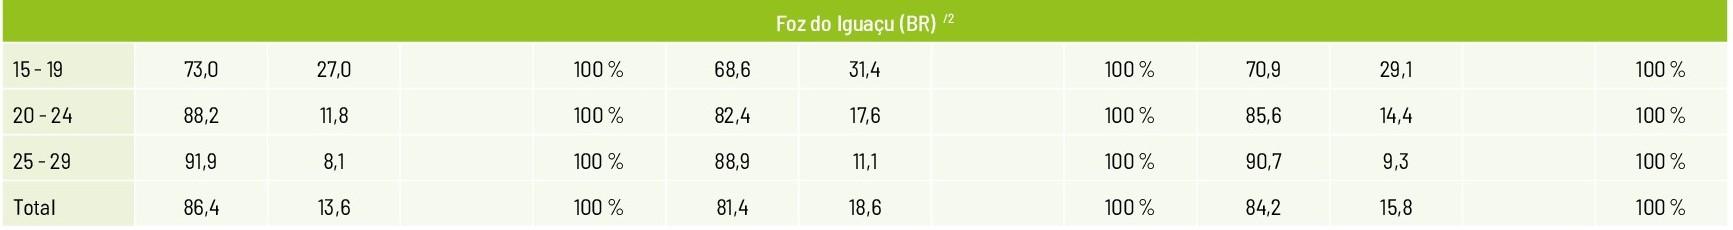 ocup1a - Copy (3)